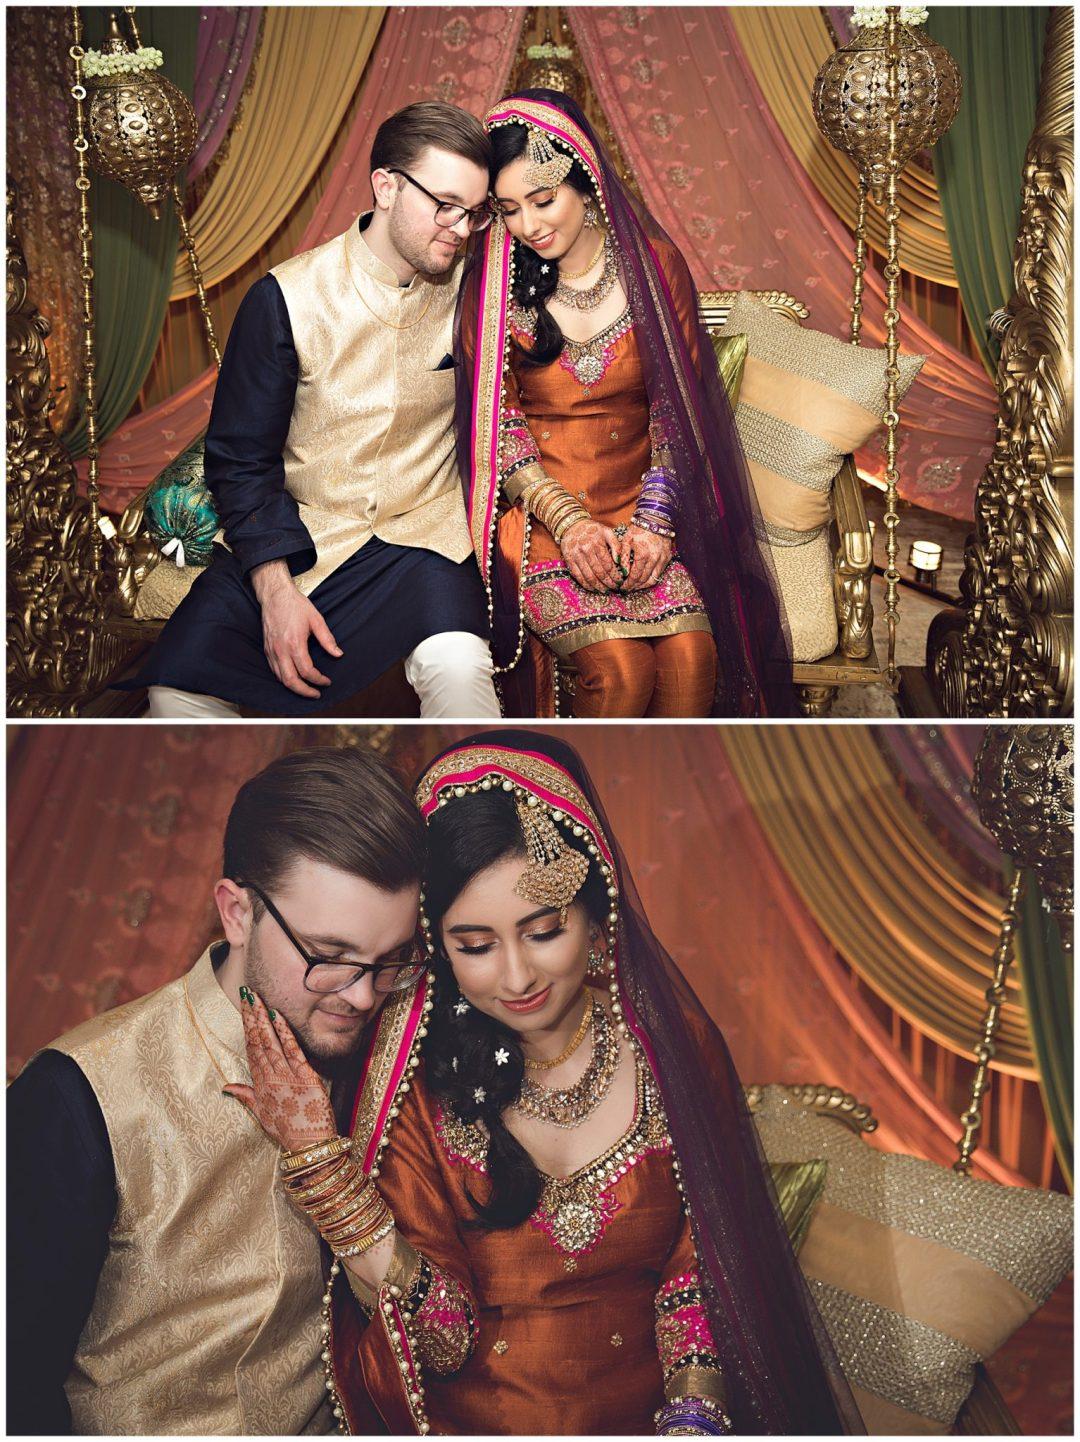 Bride and Groom at Mehndi Radisson in Kalamazoo MI